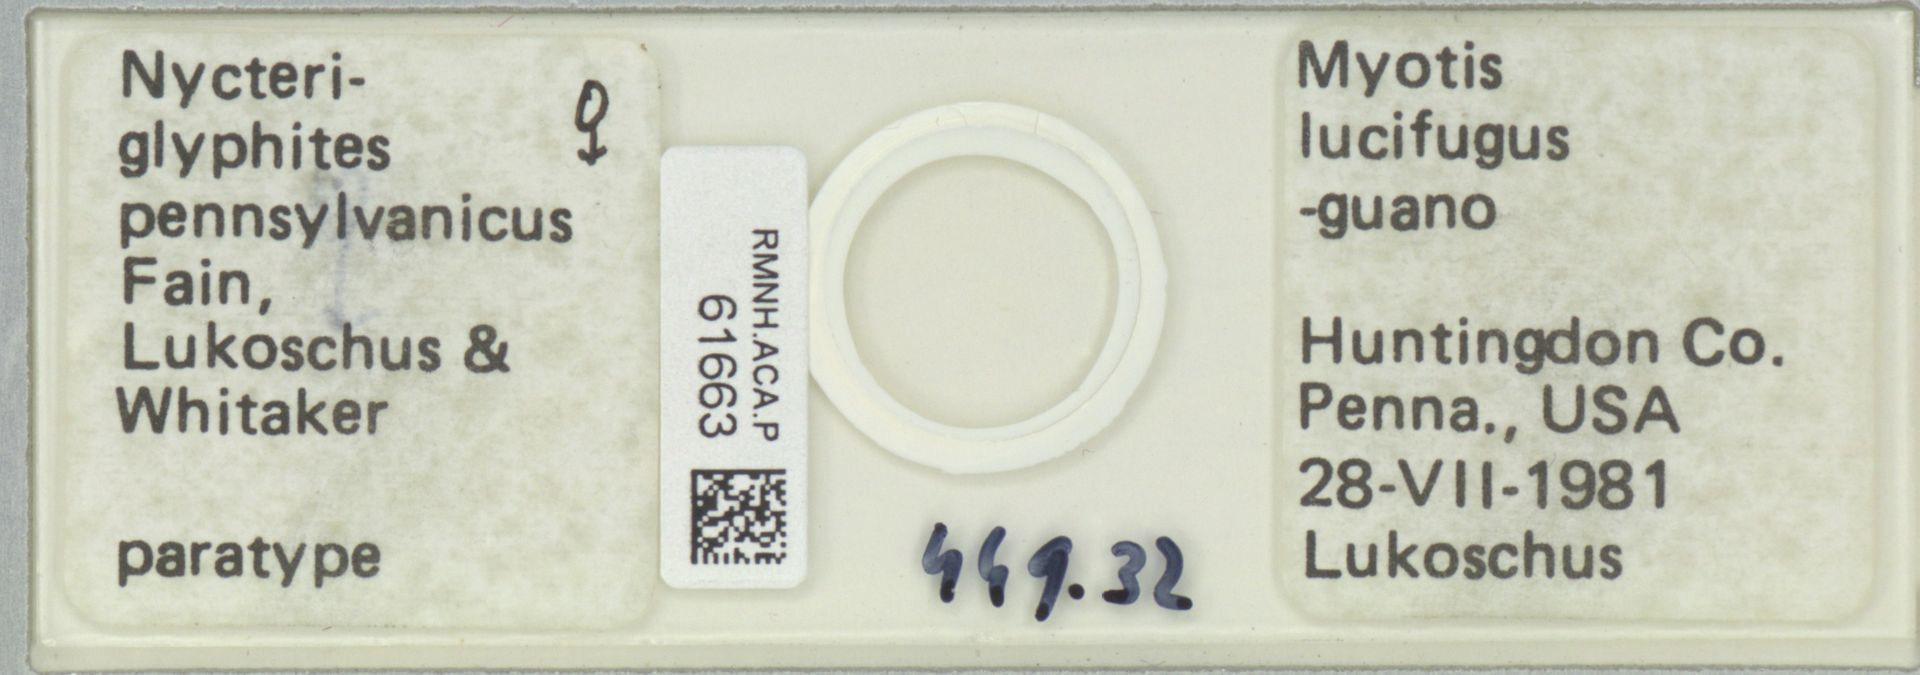 RMNH.ACA.P.61663   Nycteriglyphites pennsylvanicus Fain, Lukoschus & Whitaker